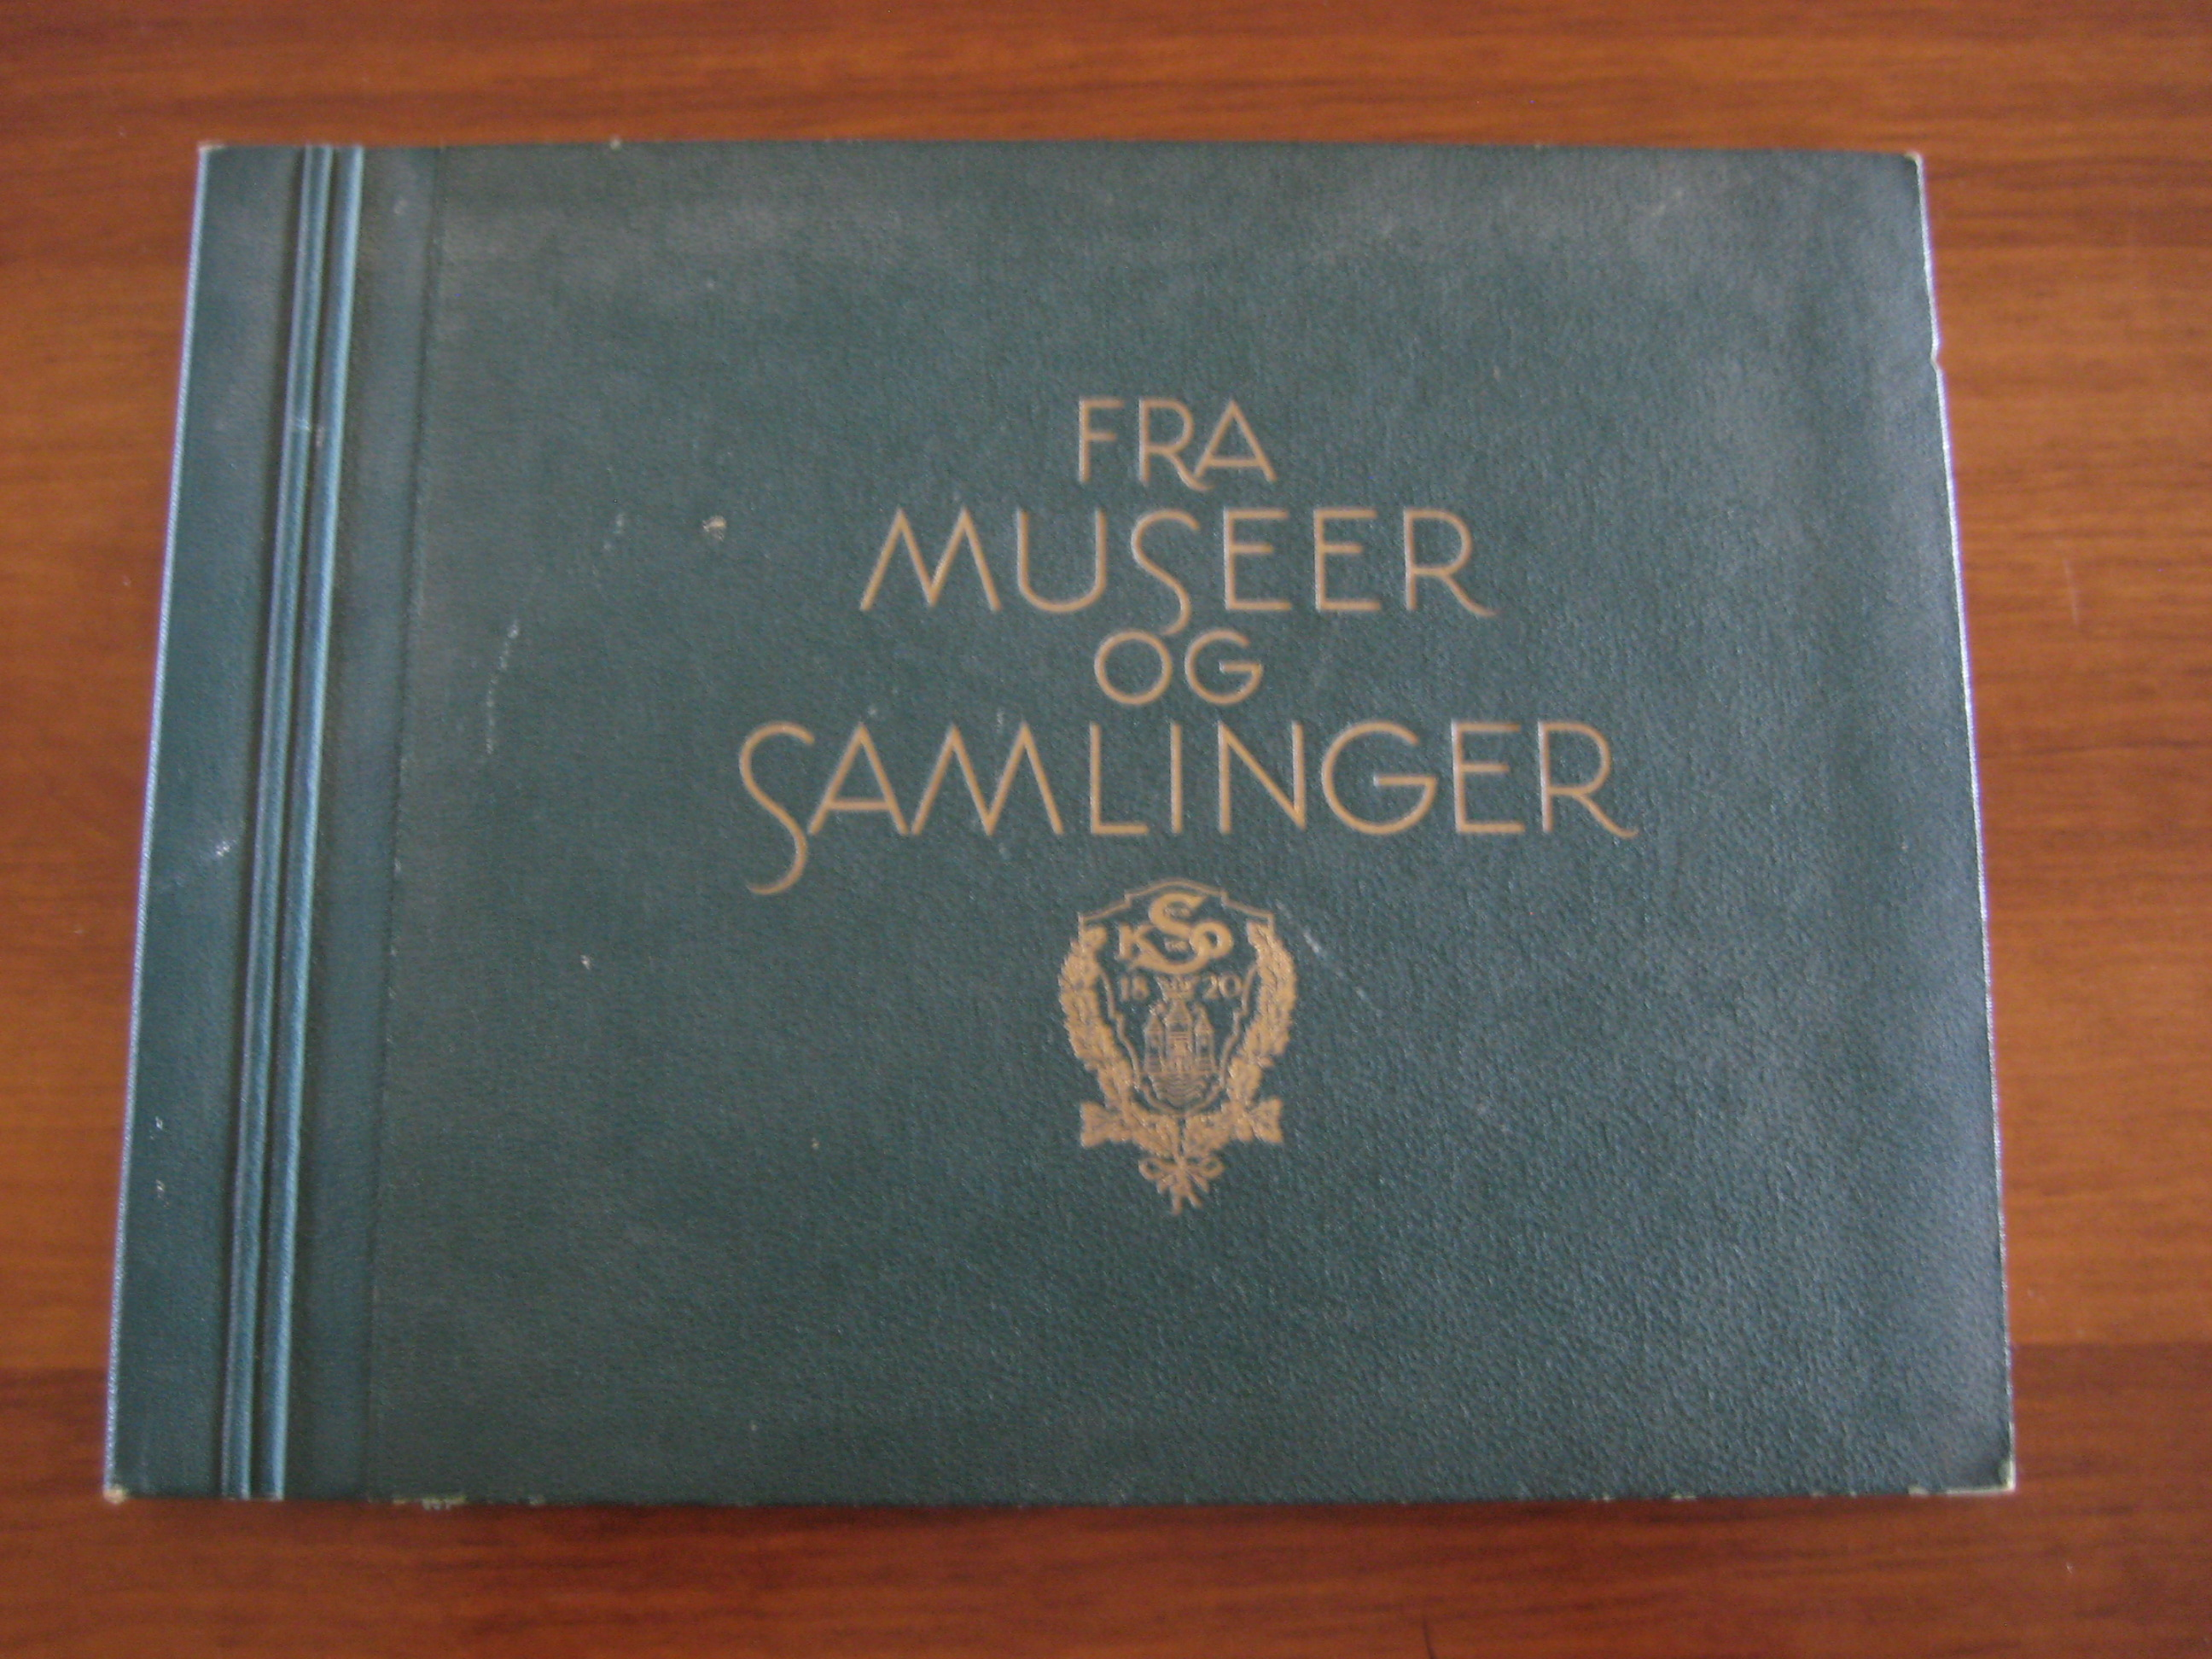 Sparekassen samlealbum fra museer